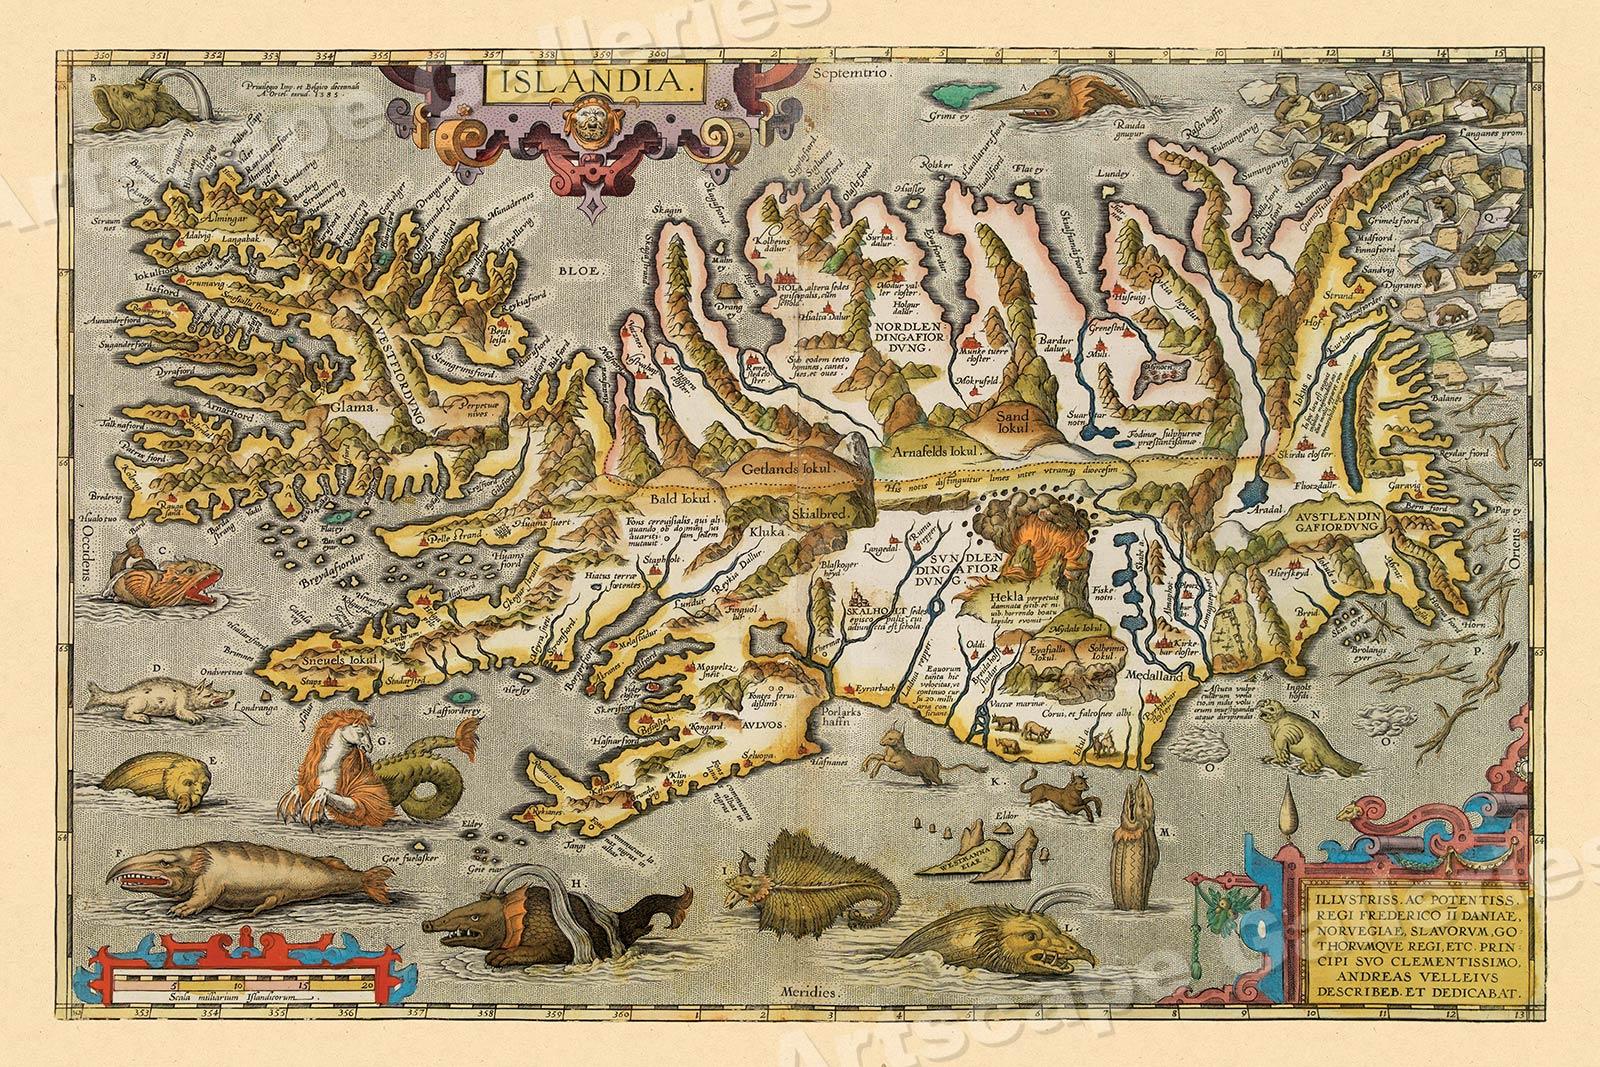 1590 John White's Virginia Historic Vintage Style Unique Wall Map 24x32